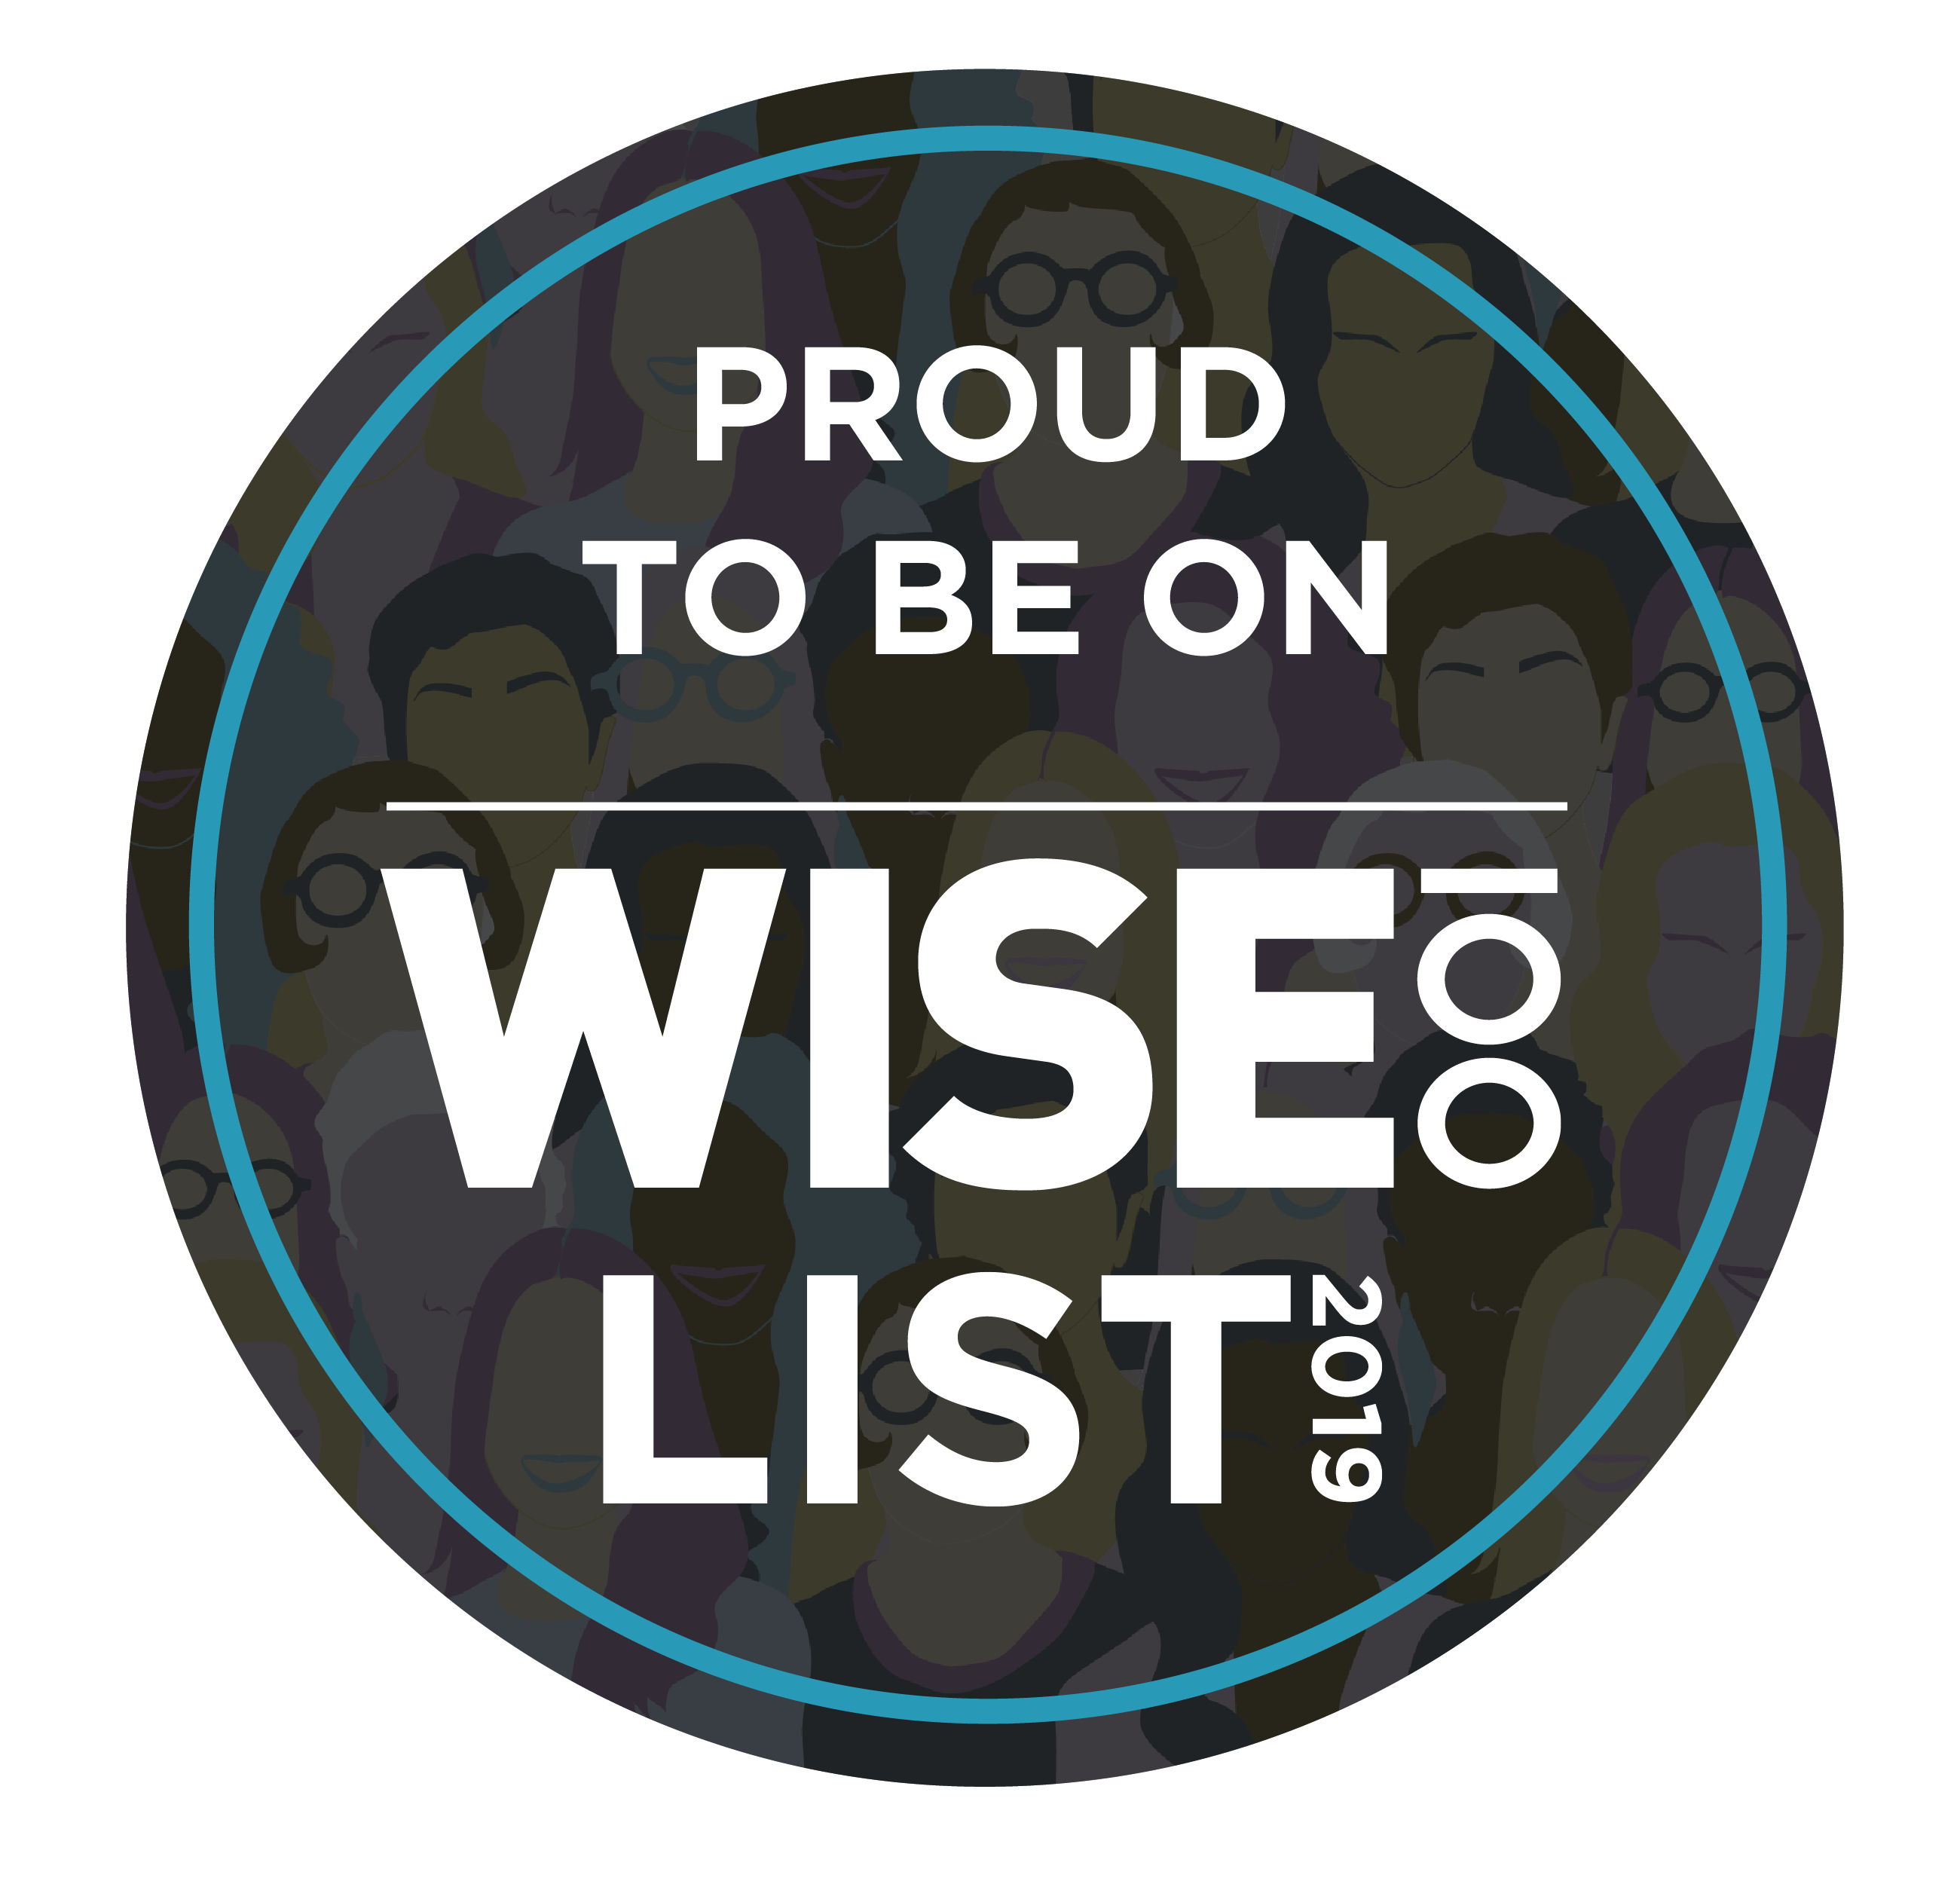 Wise 100 List